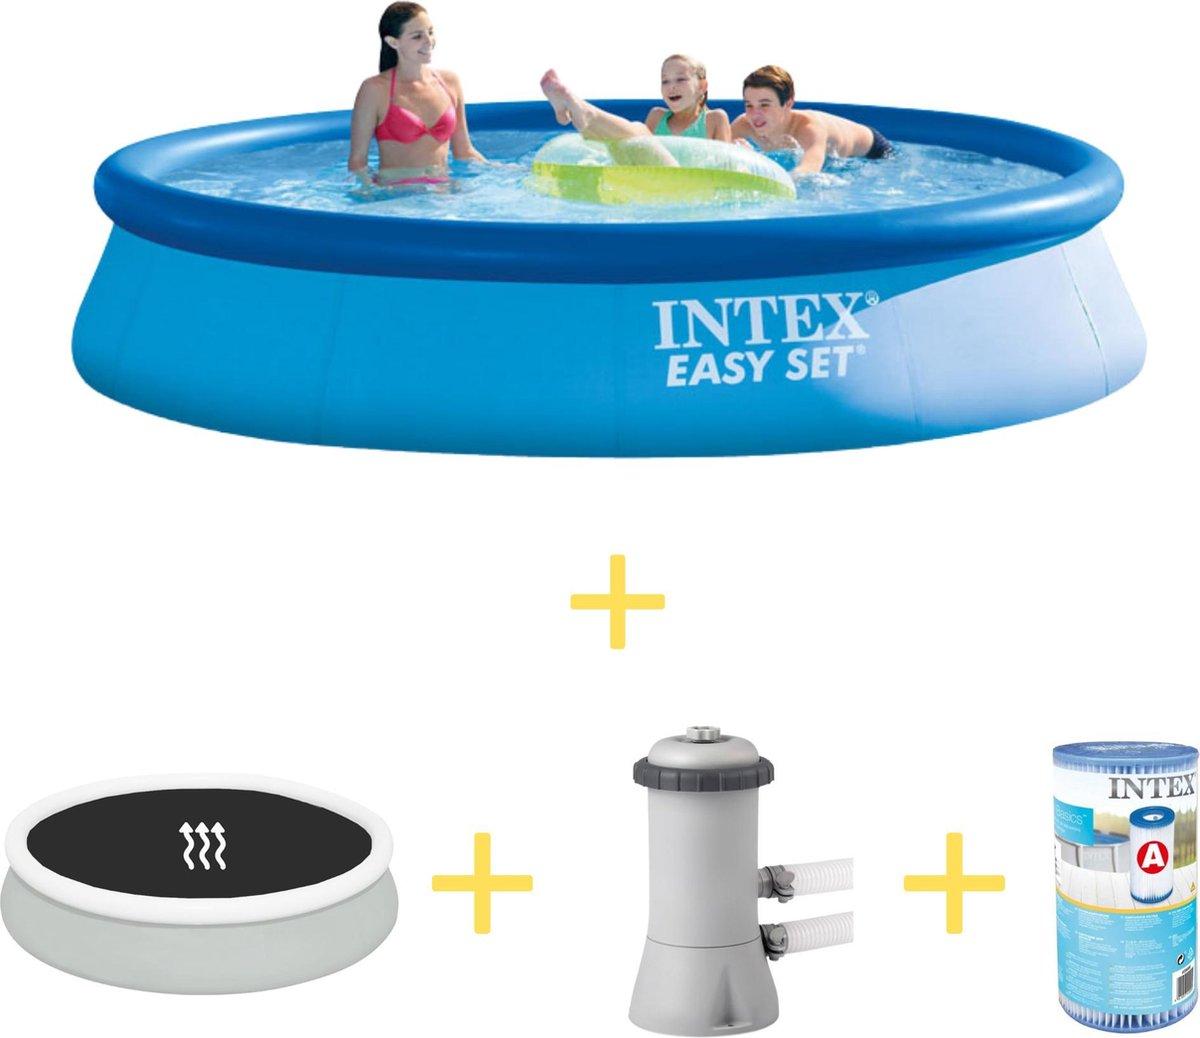 Intex Zwembad - Easy Set - 396 x 84 cm - Inclusief Solarzeil, Filterpomp & Filter